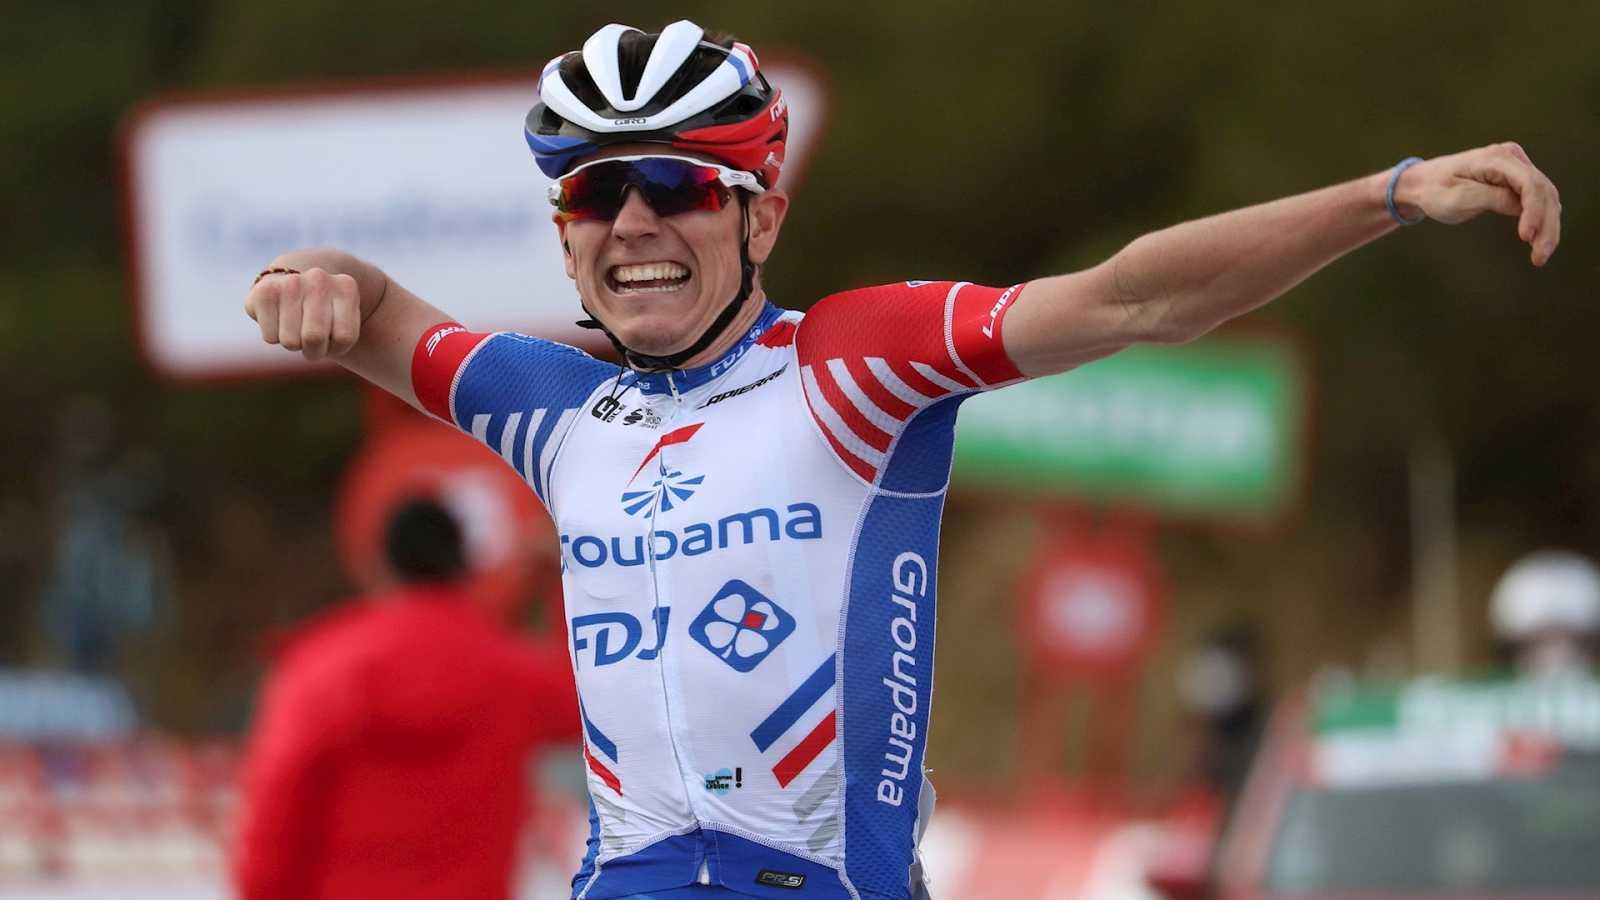 Vuelta ciclista a España - Victoria de David Gaudu en la etapa 11 - Escuchar ahora